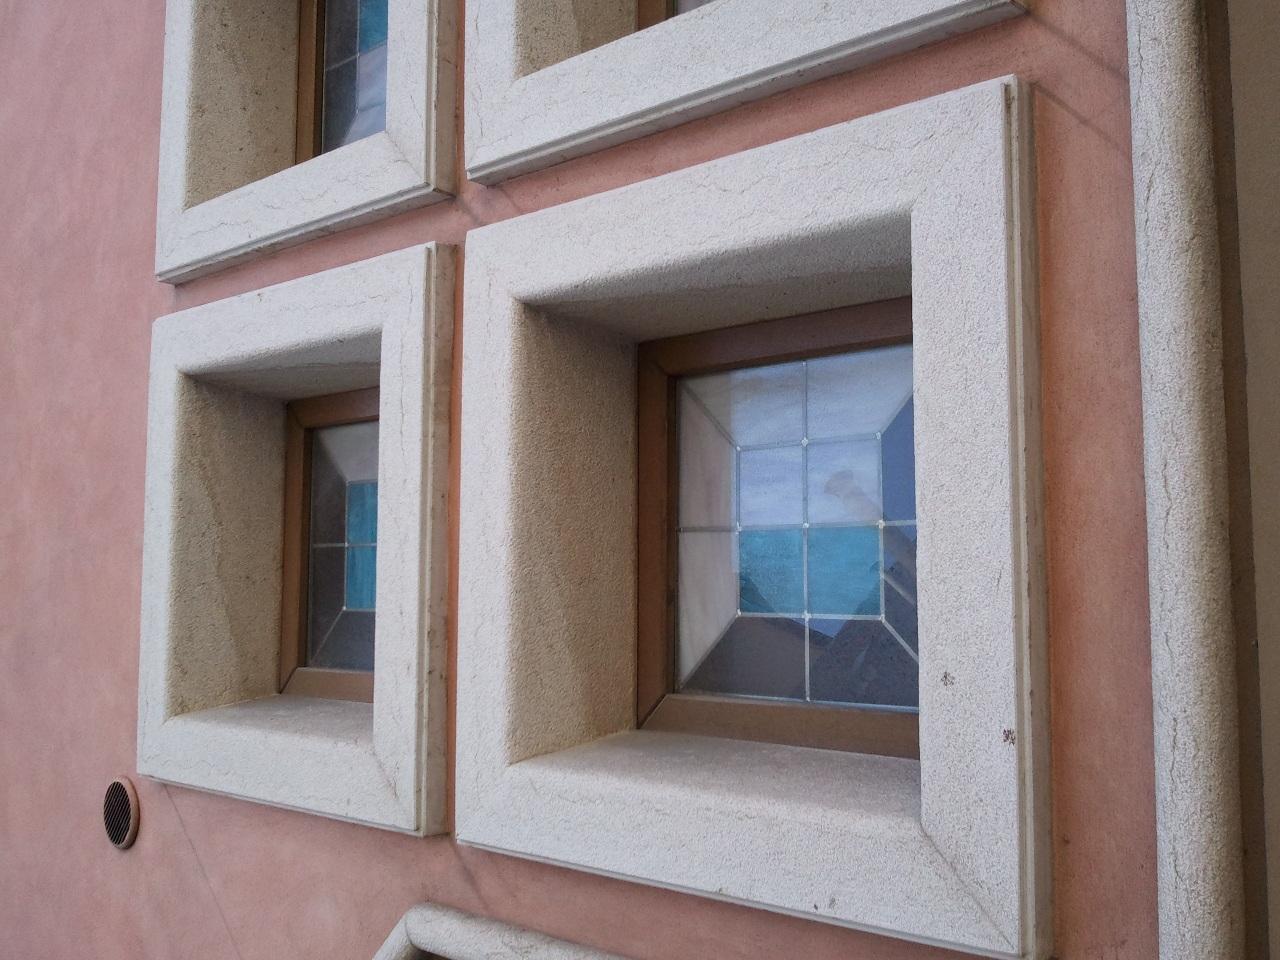 Soglie finestre moderne free soglie per porte e finestre - Soglie in marmo per finestre ...